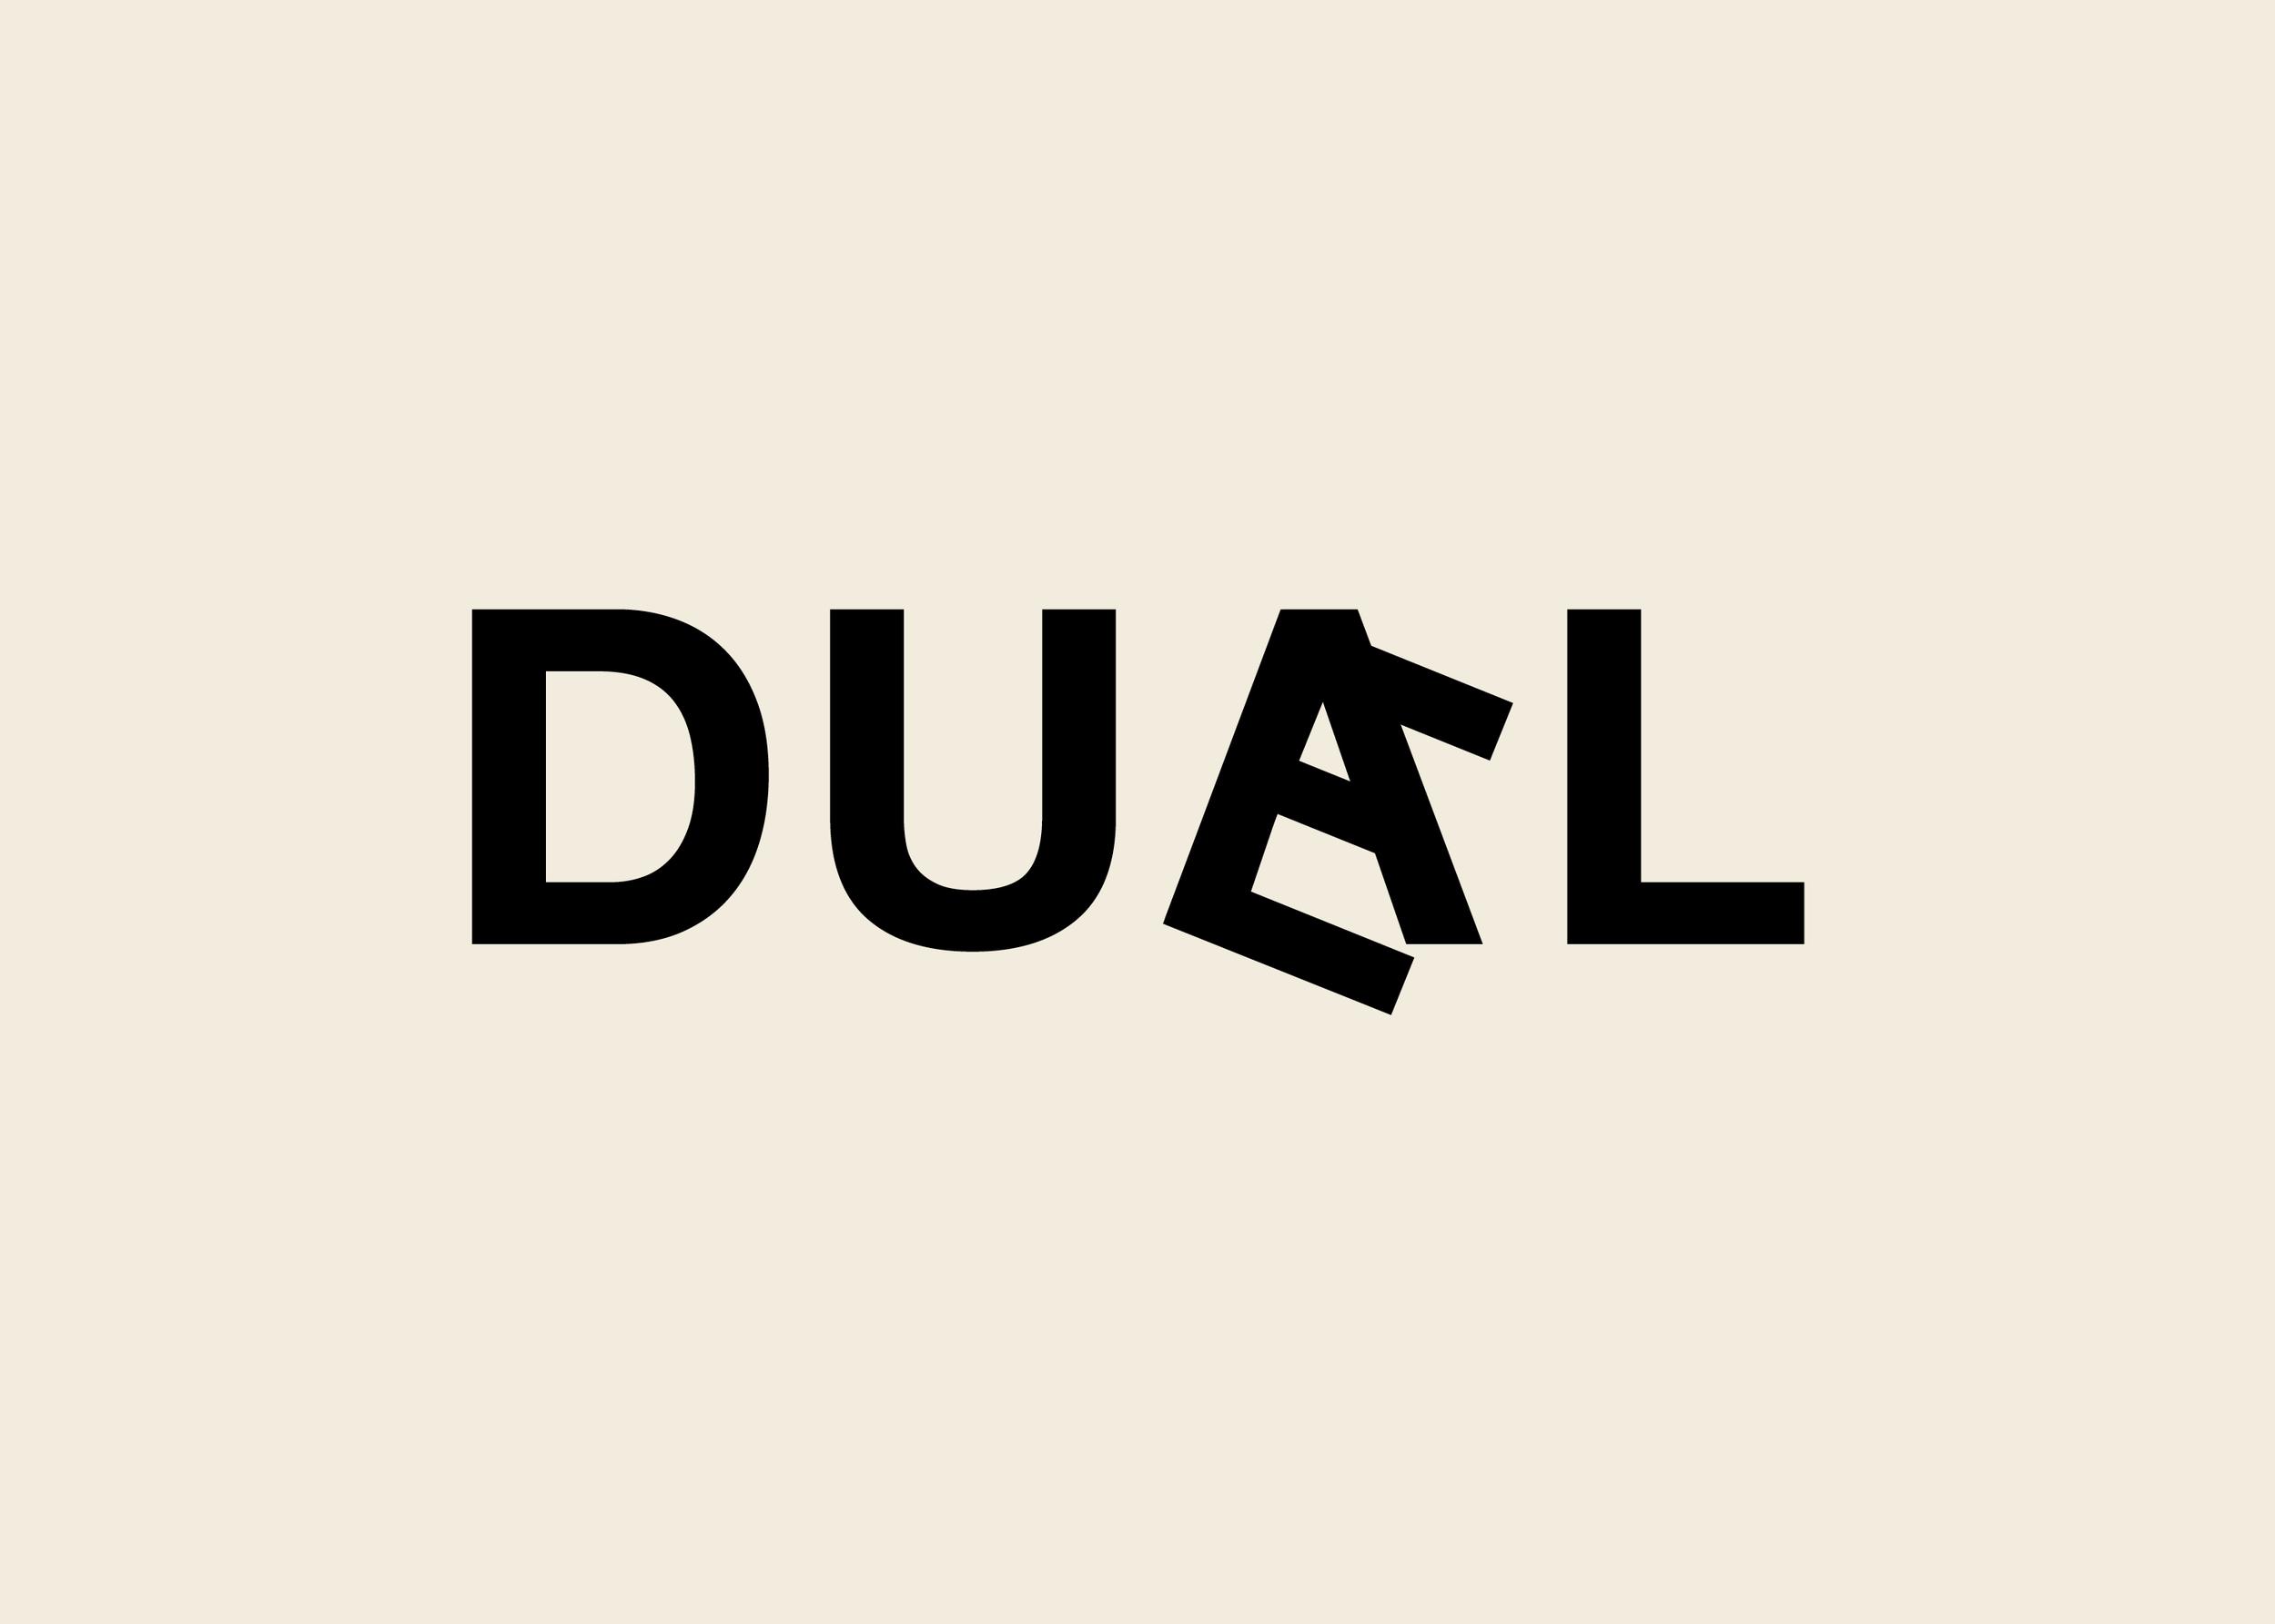 duael_flip2.png